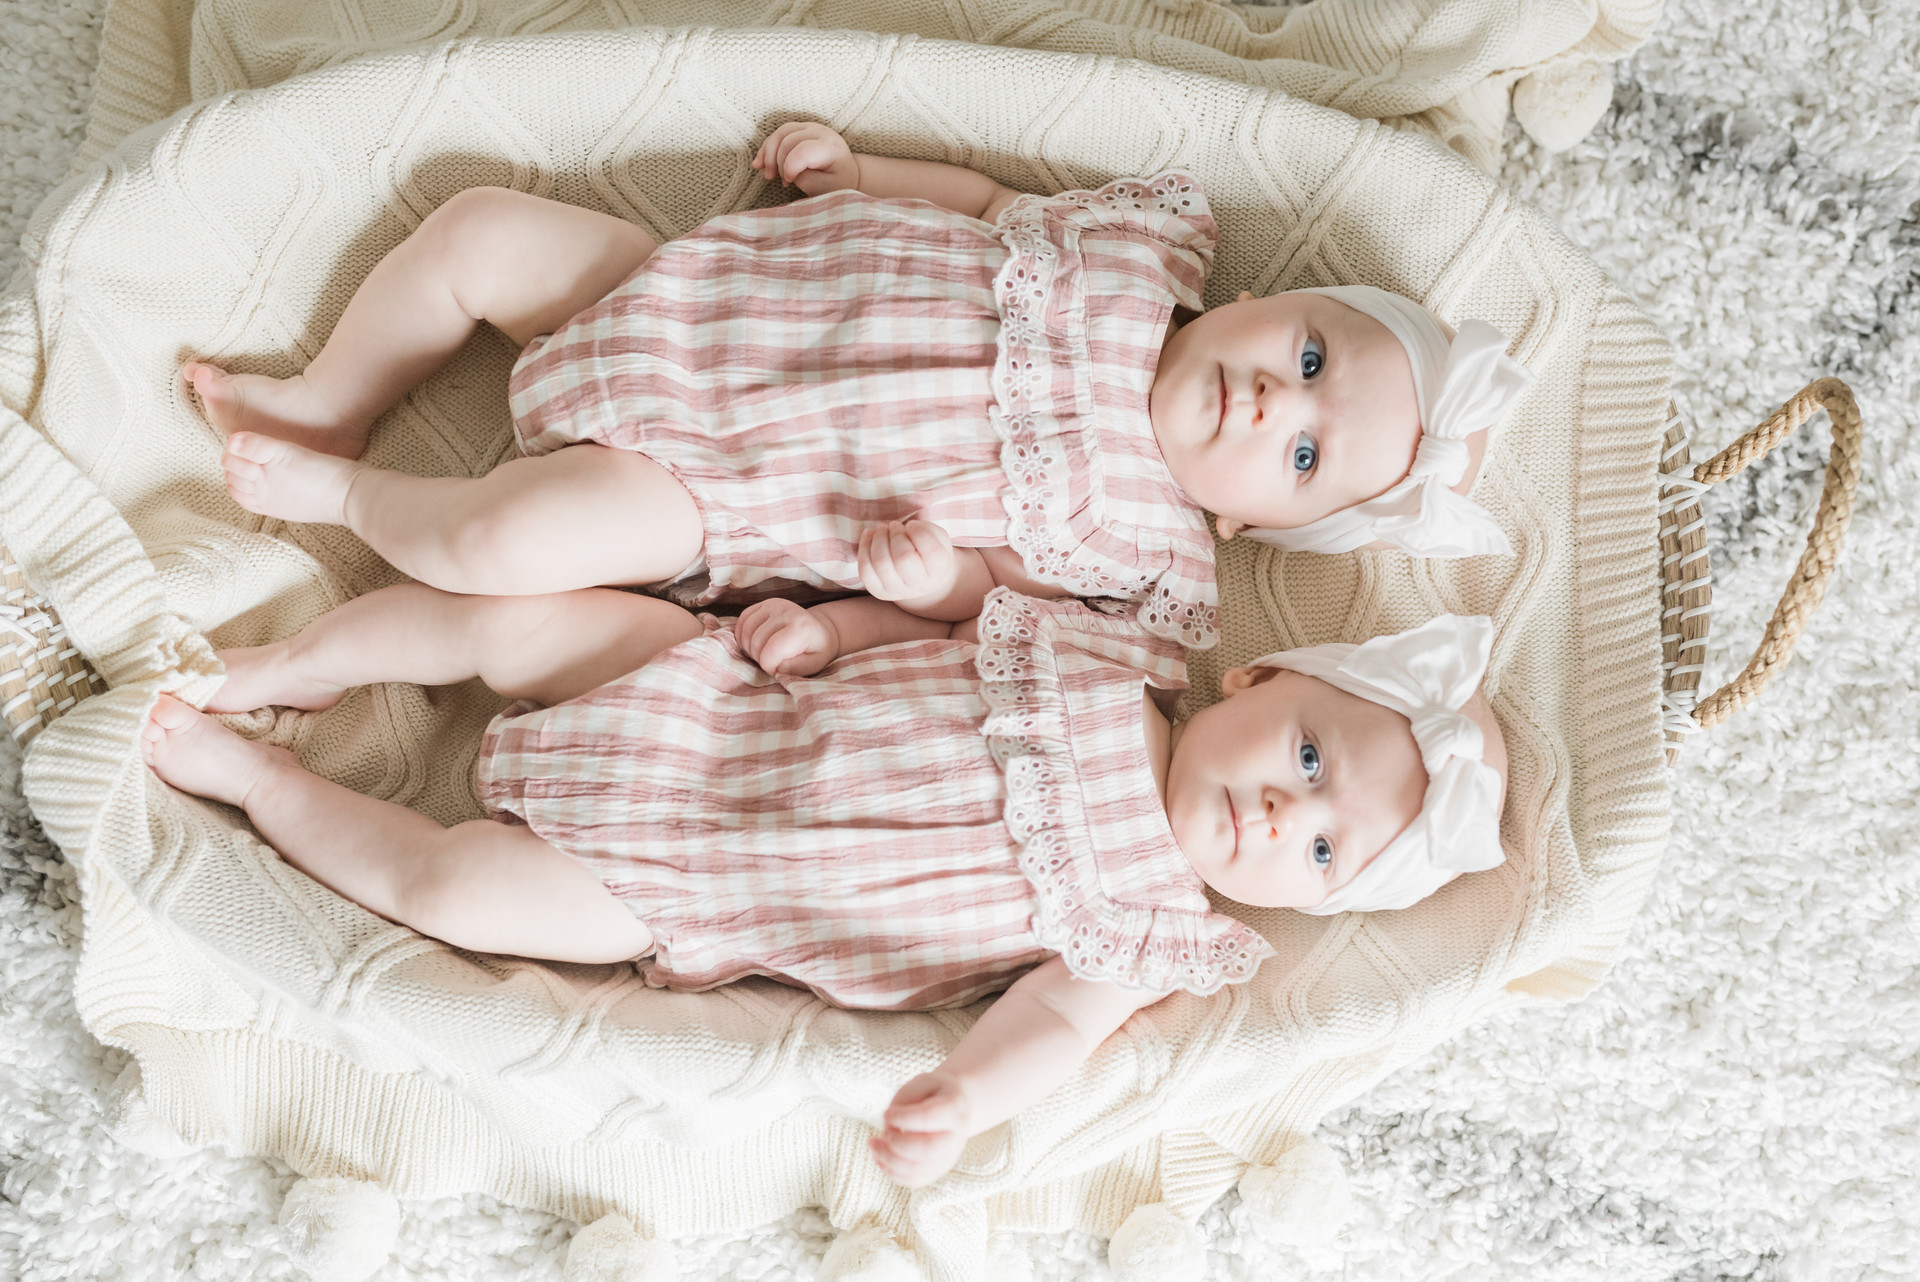 twins_068.jpg